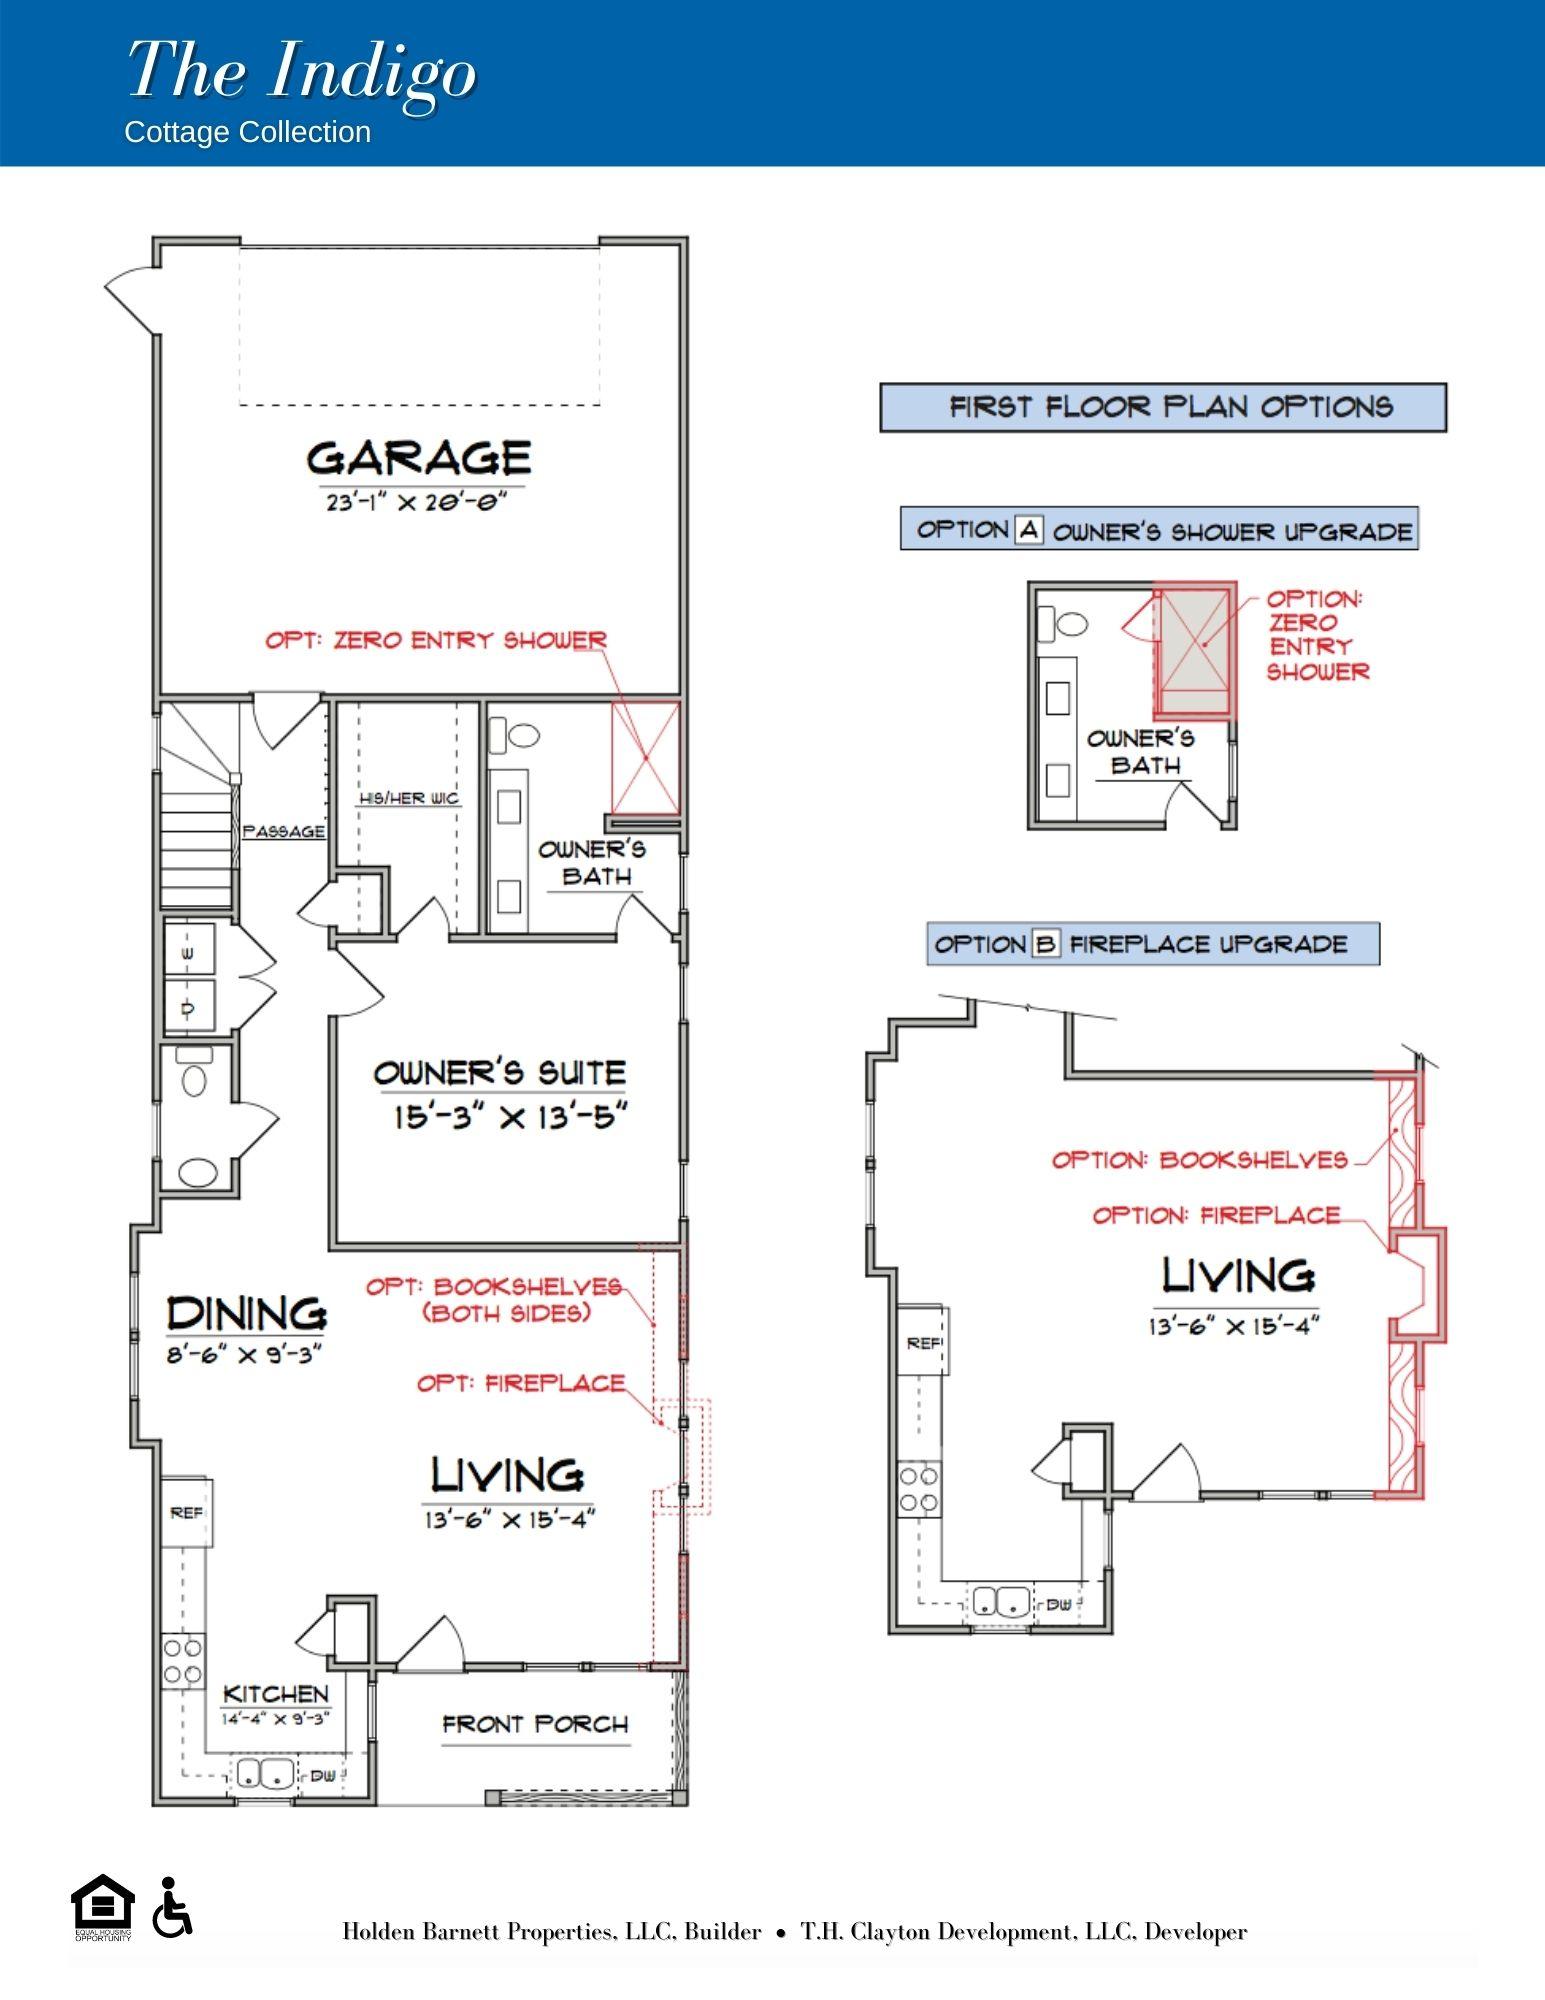 The Indigo First Floor Floorplan Options